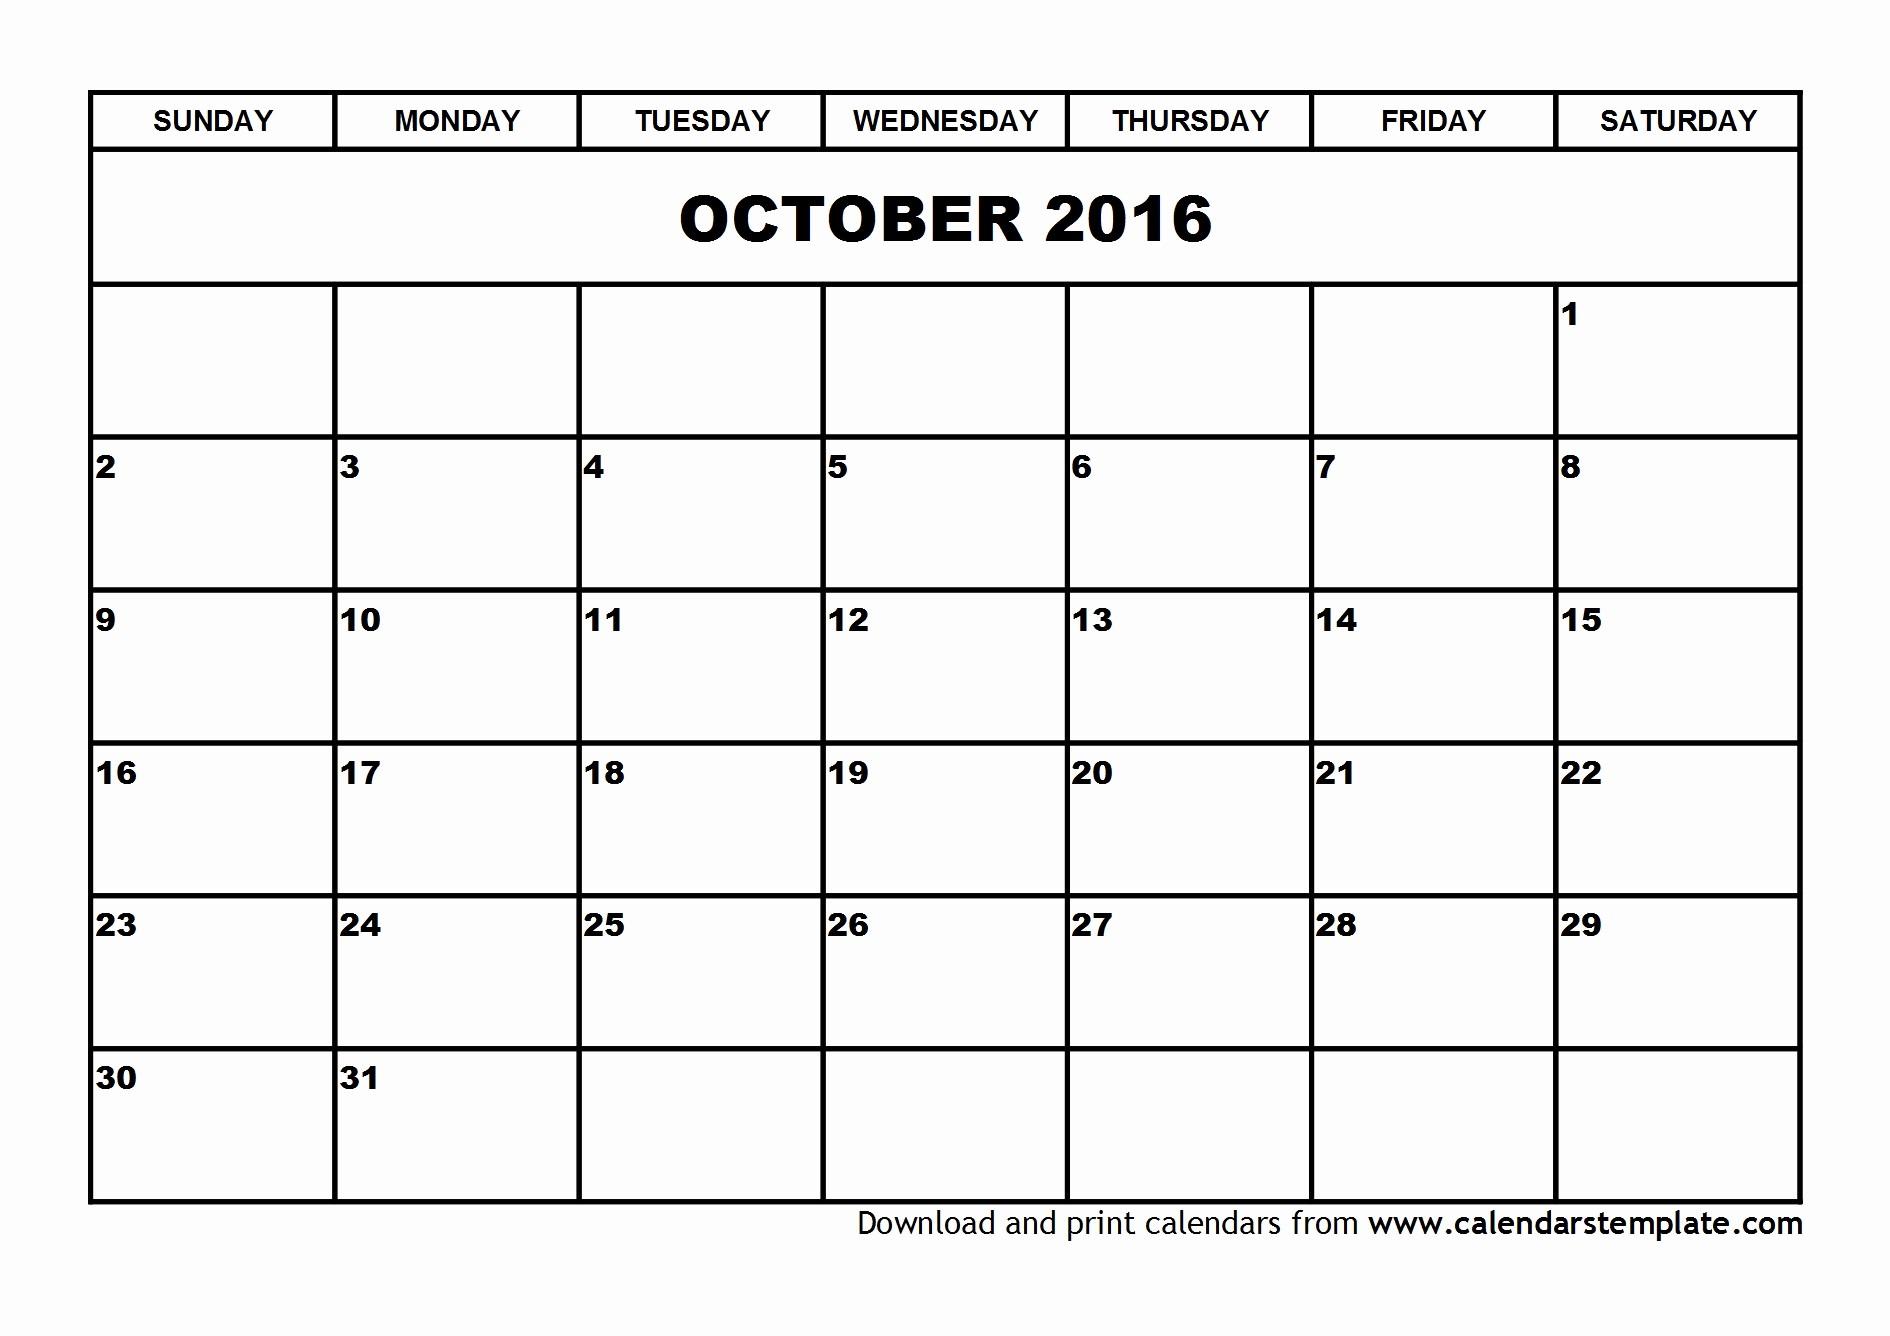 Free Printable Calendars 2016 Templates Awesome October 2016 Calendar Template